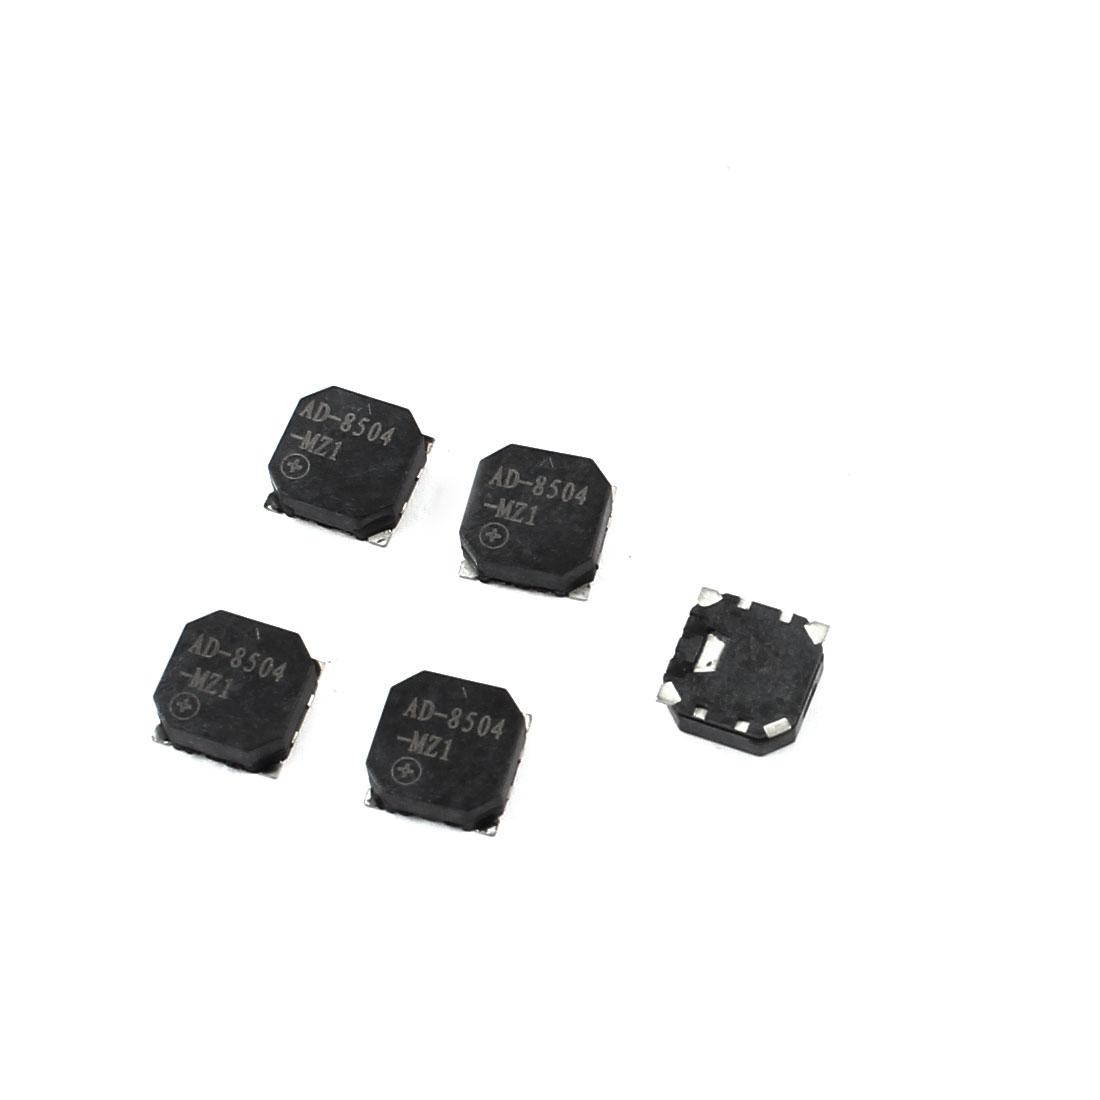 5pcs 8.5mm x 8.5mm x 3mm Square Shape Passive SMD Buzzer Black DC 1-30V 90mA